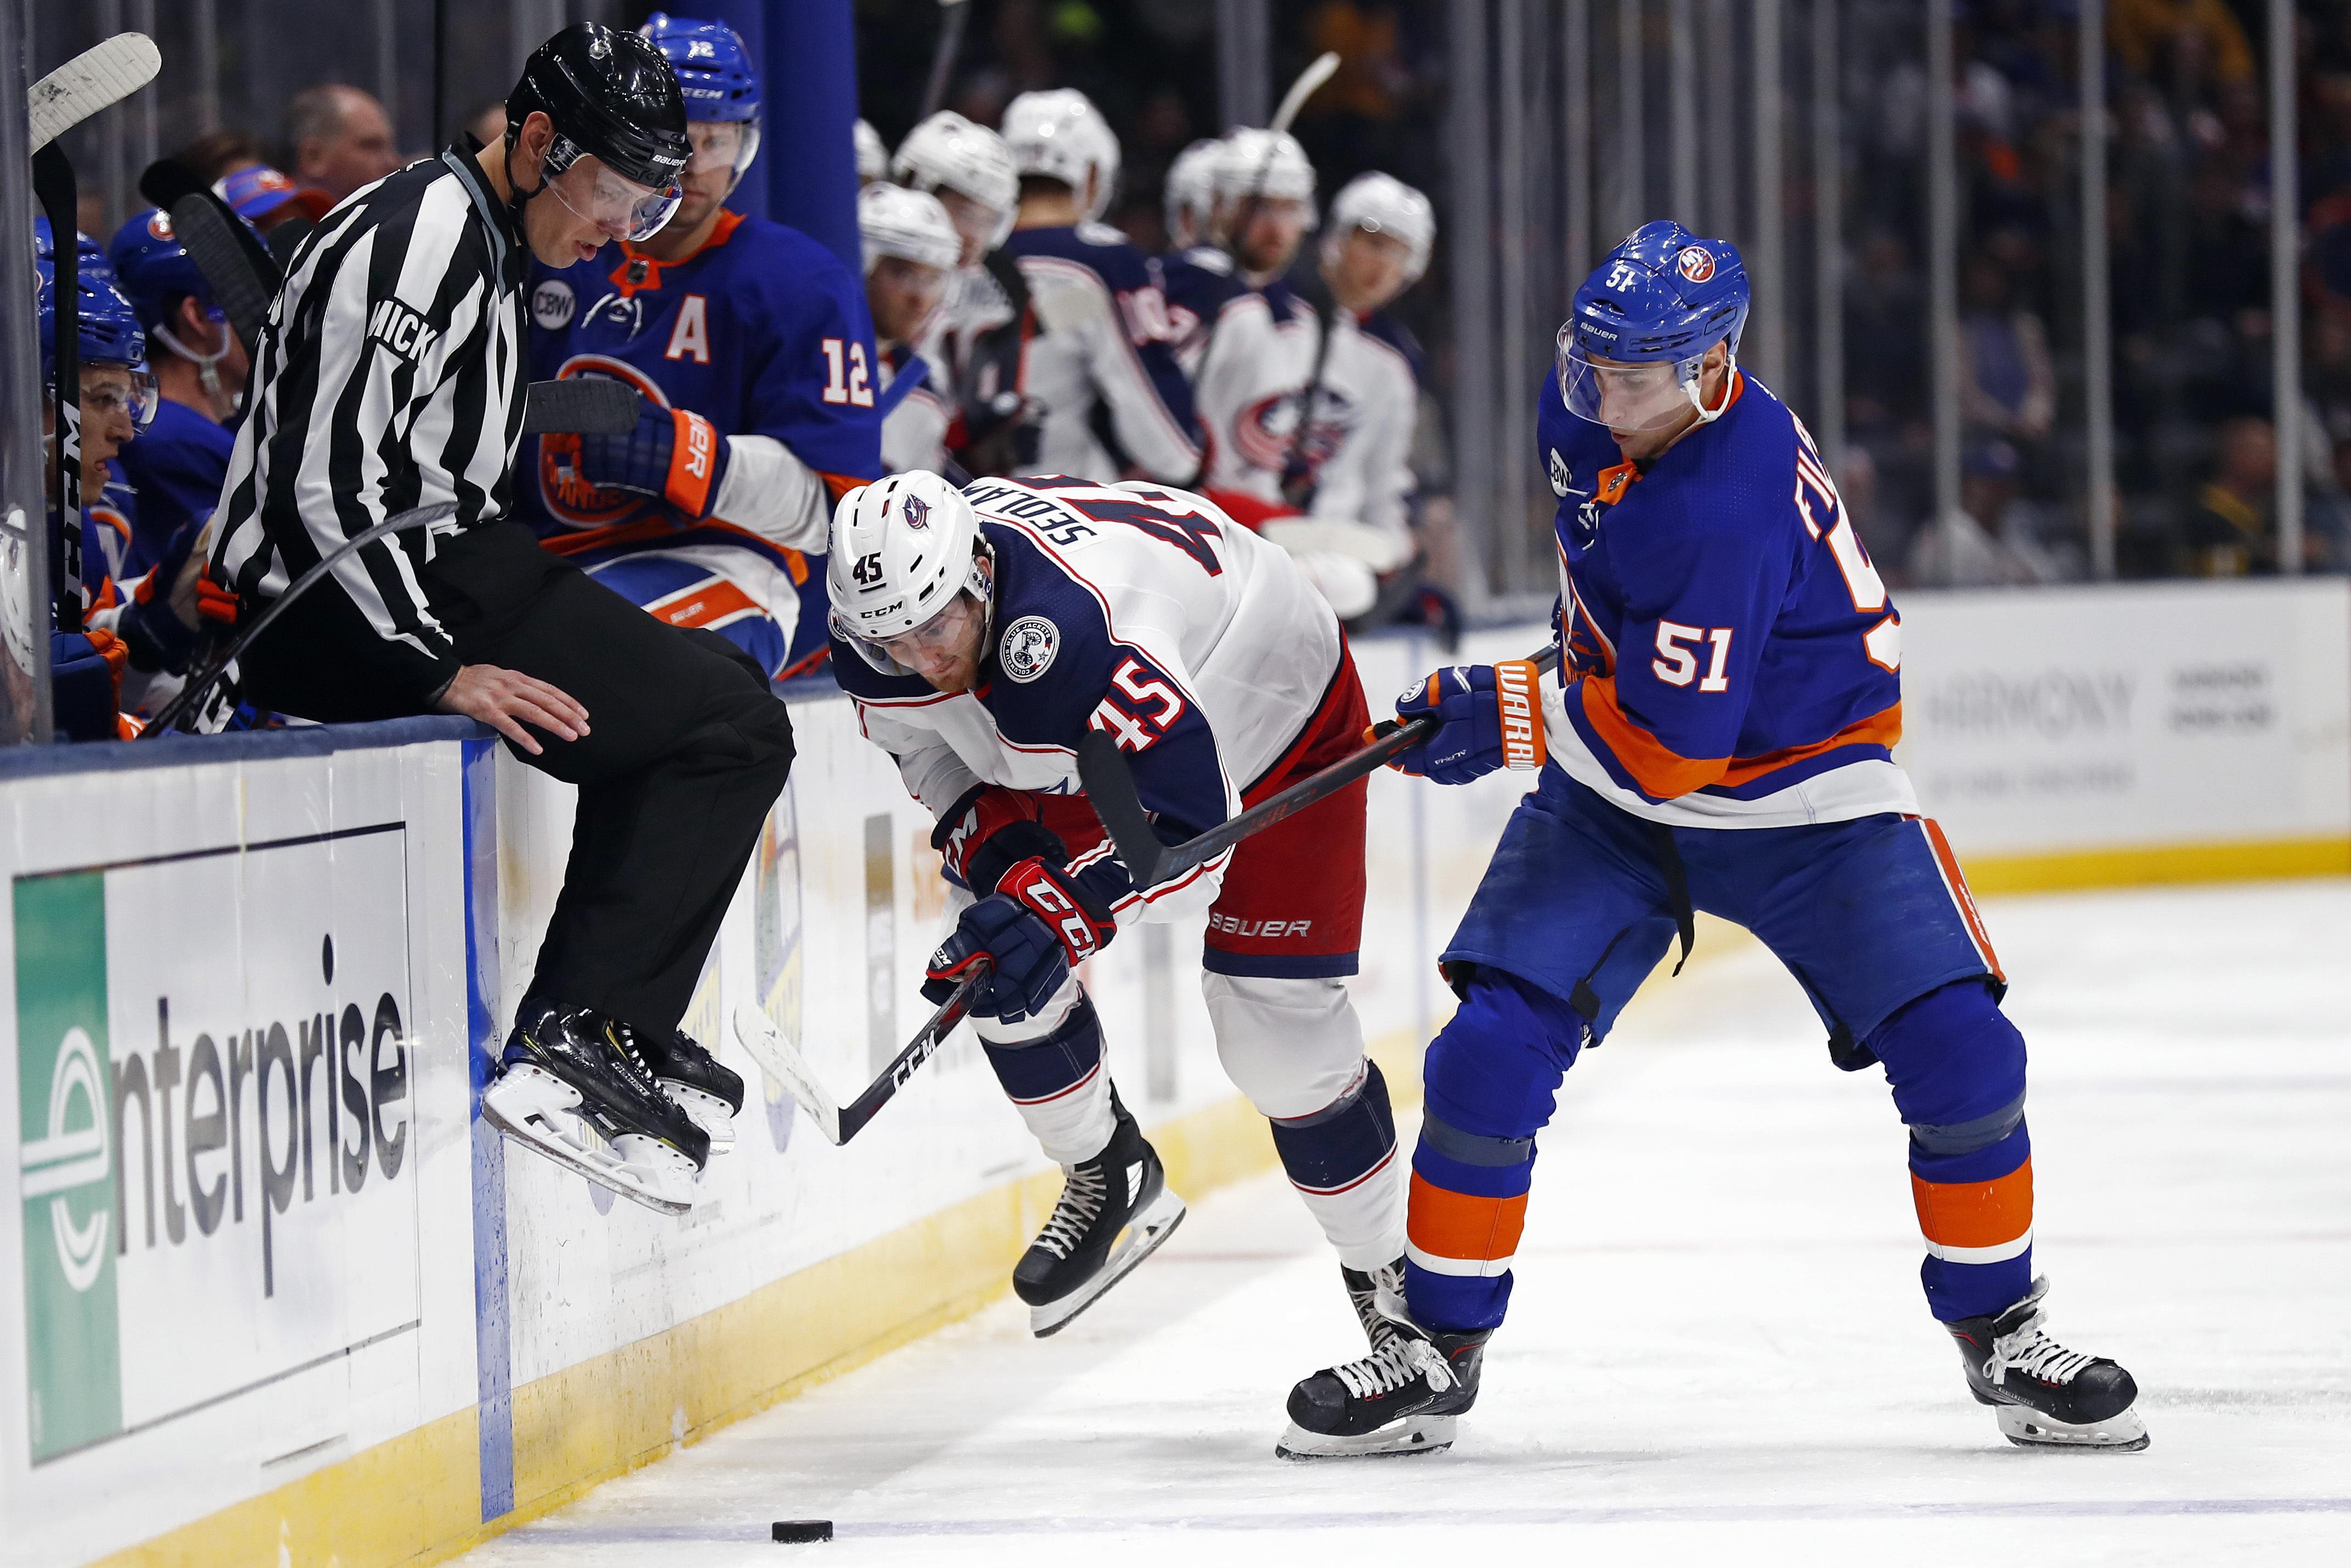 376a4617d24 Columbus Blue Jackets center Lukas Sedlak (45) and New York Islanders  center Valtteri Filppula